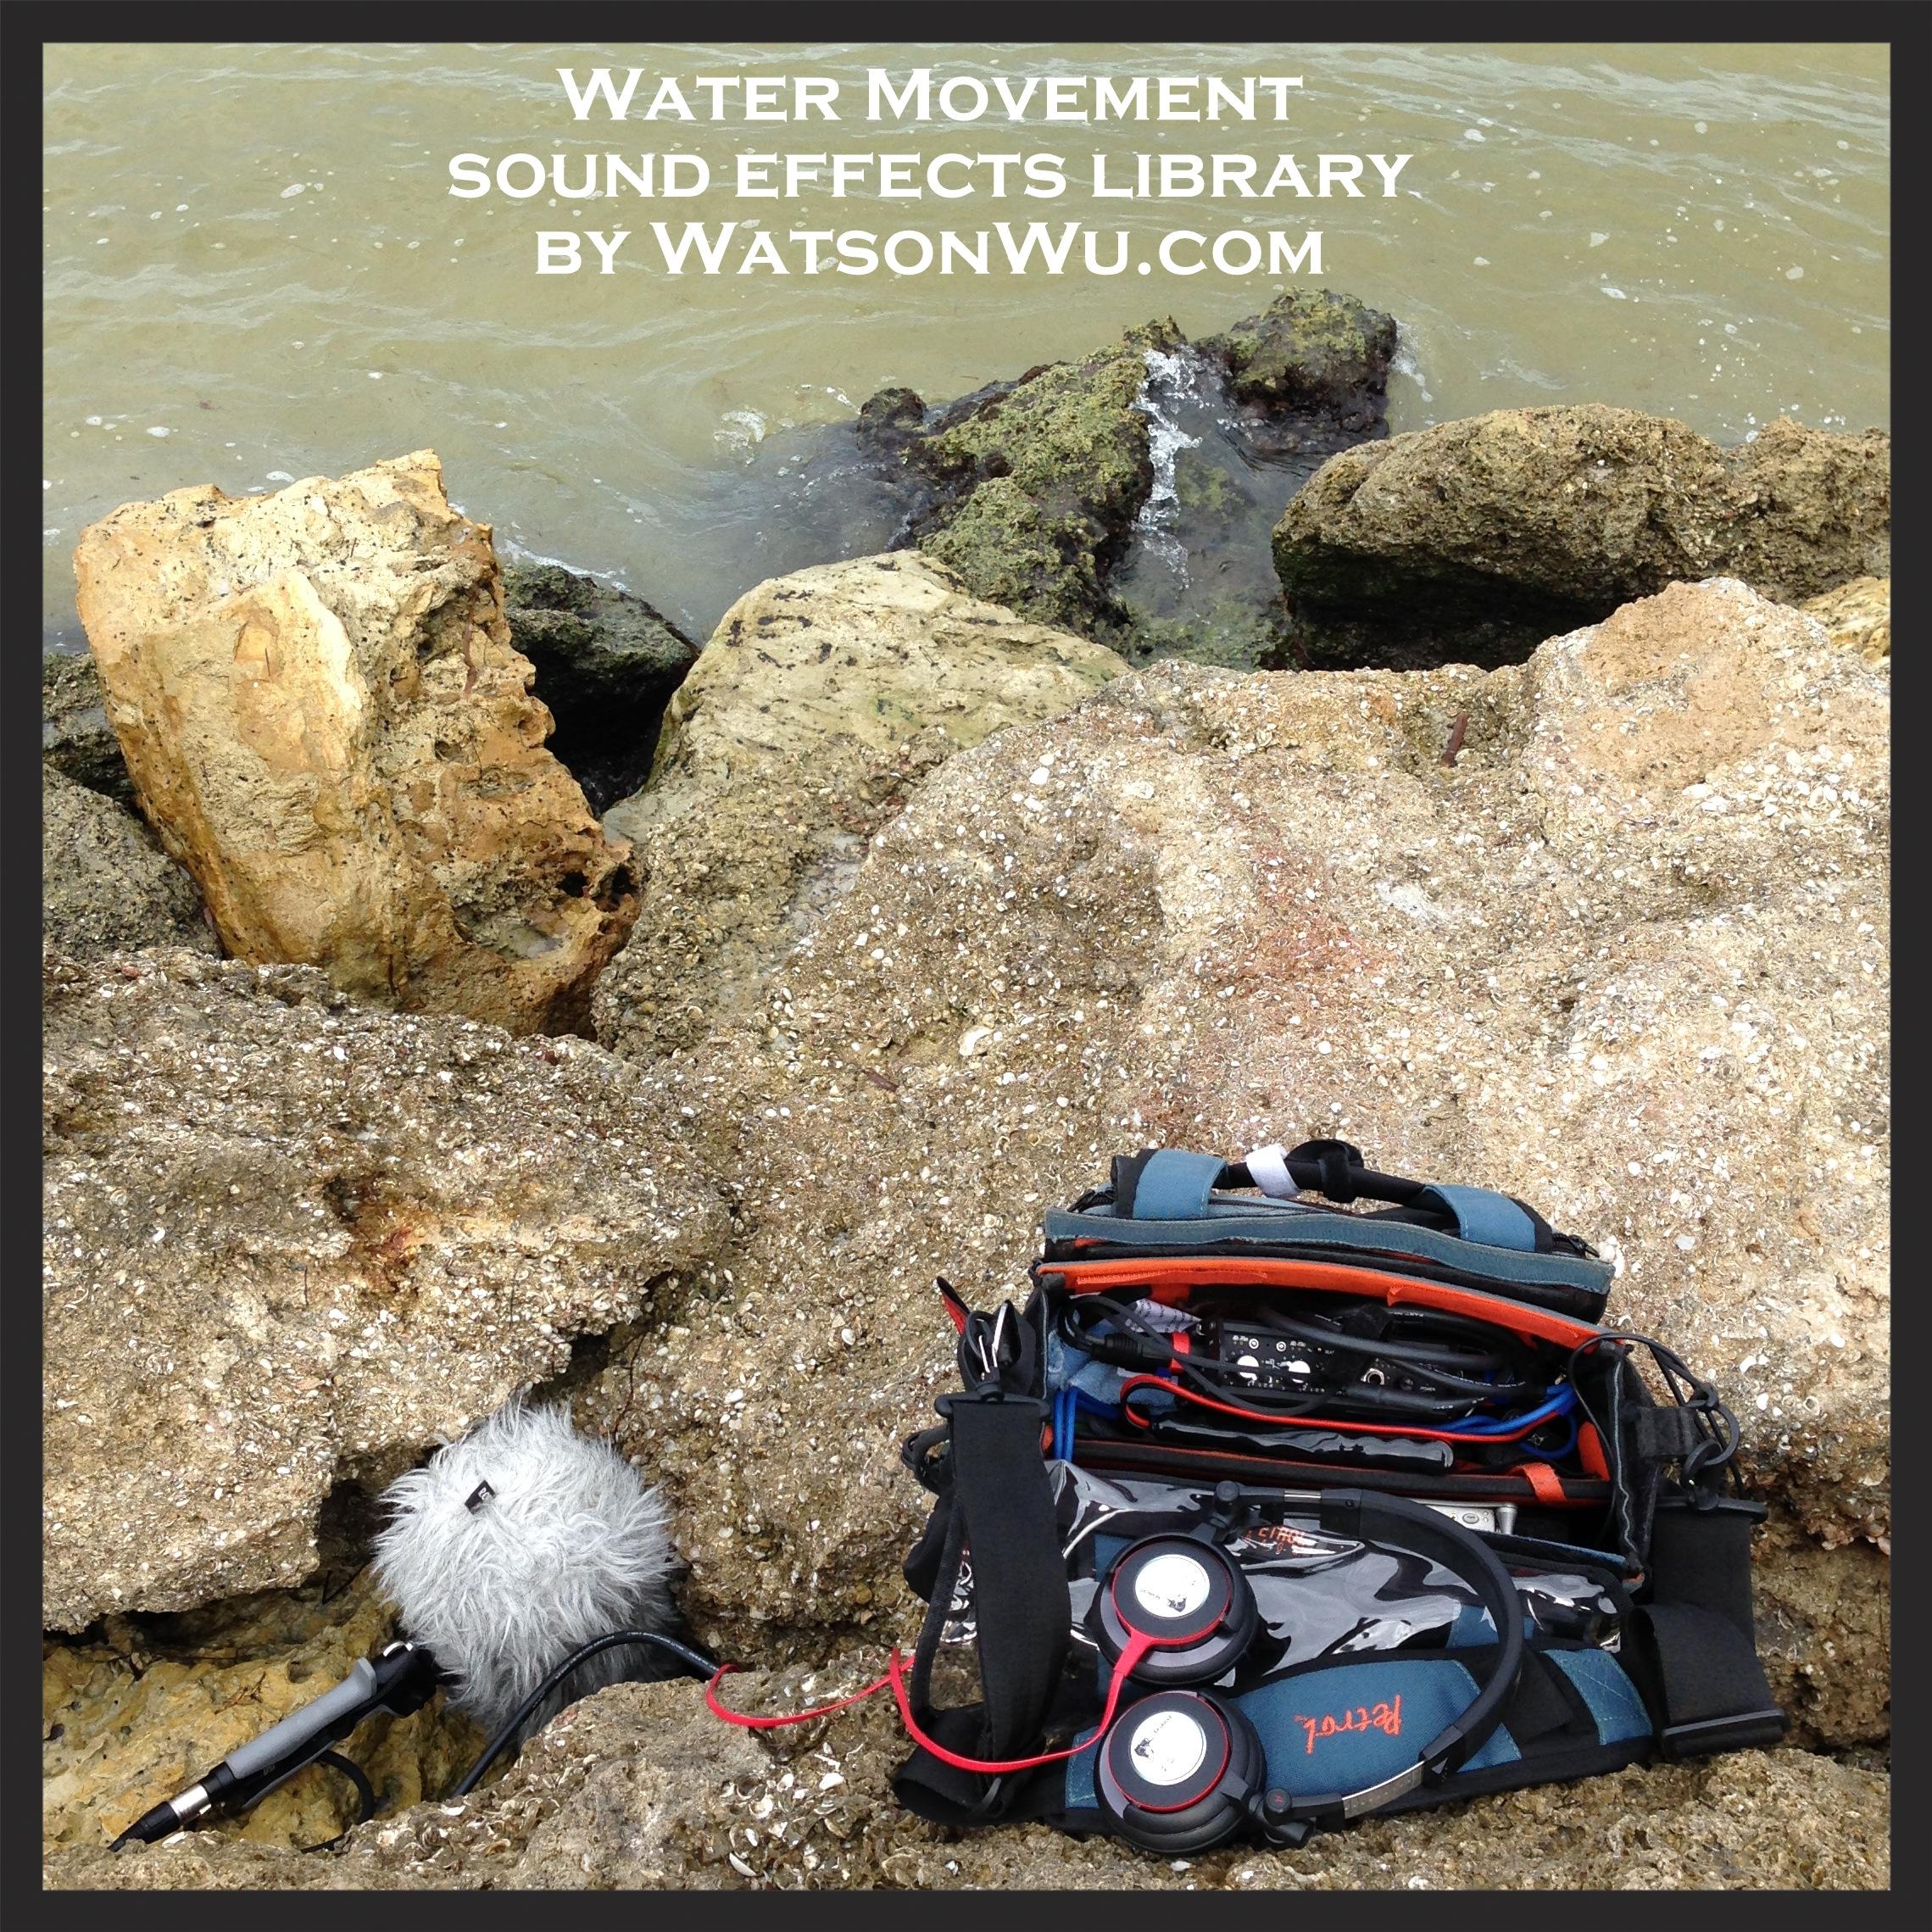 WatsonWu.com - Water Movements (Part 1 Between Rocks) sound clips square.jpg